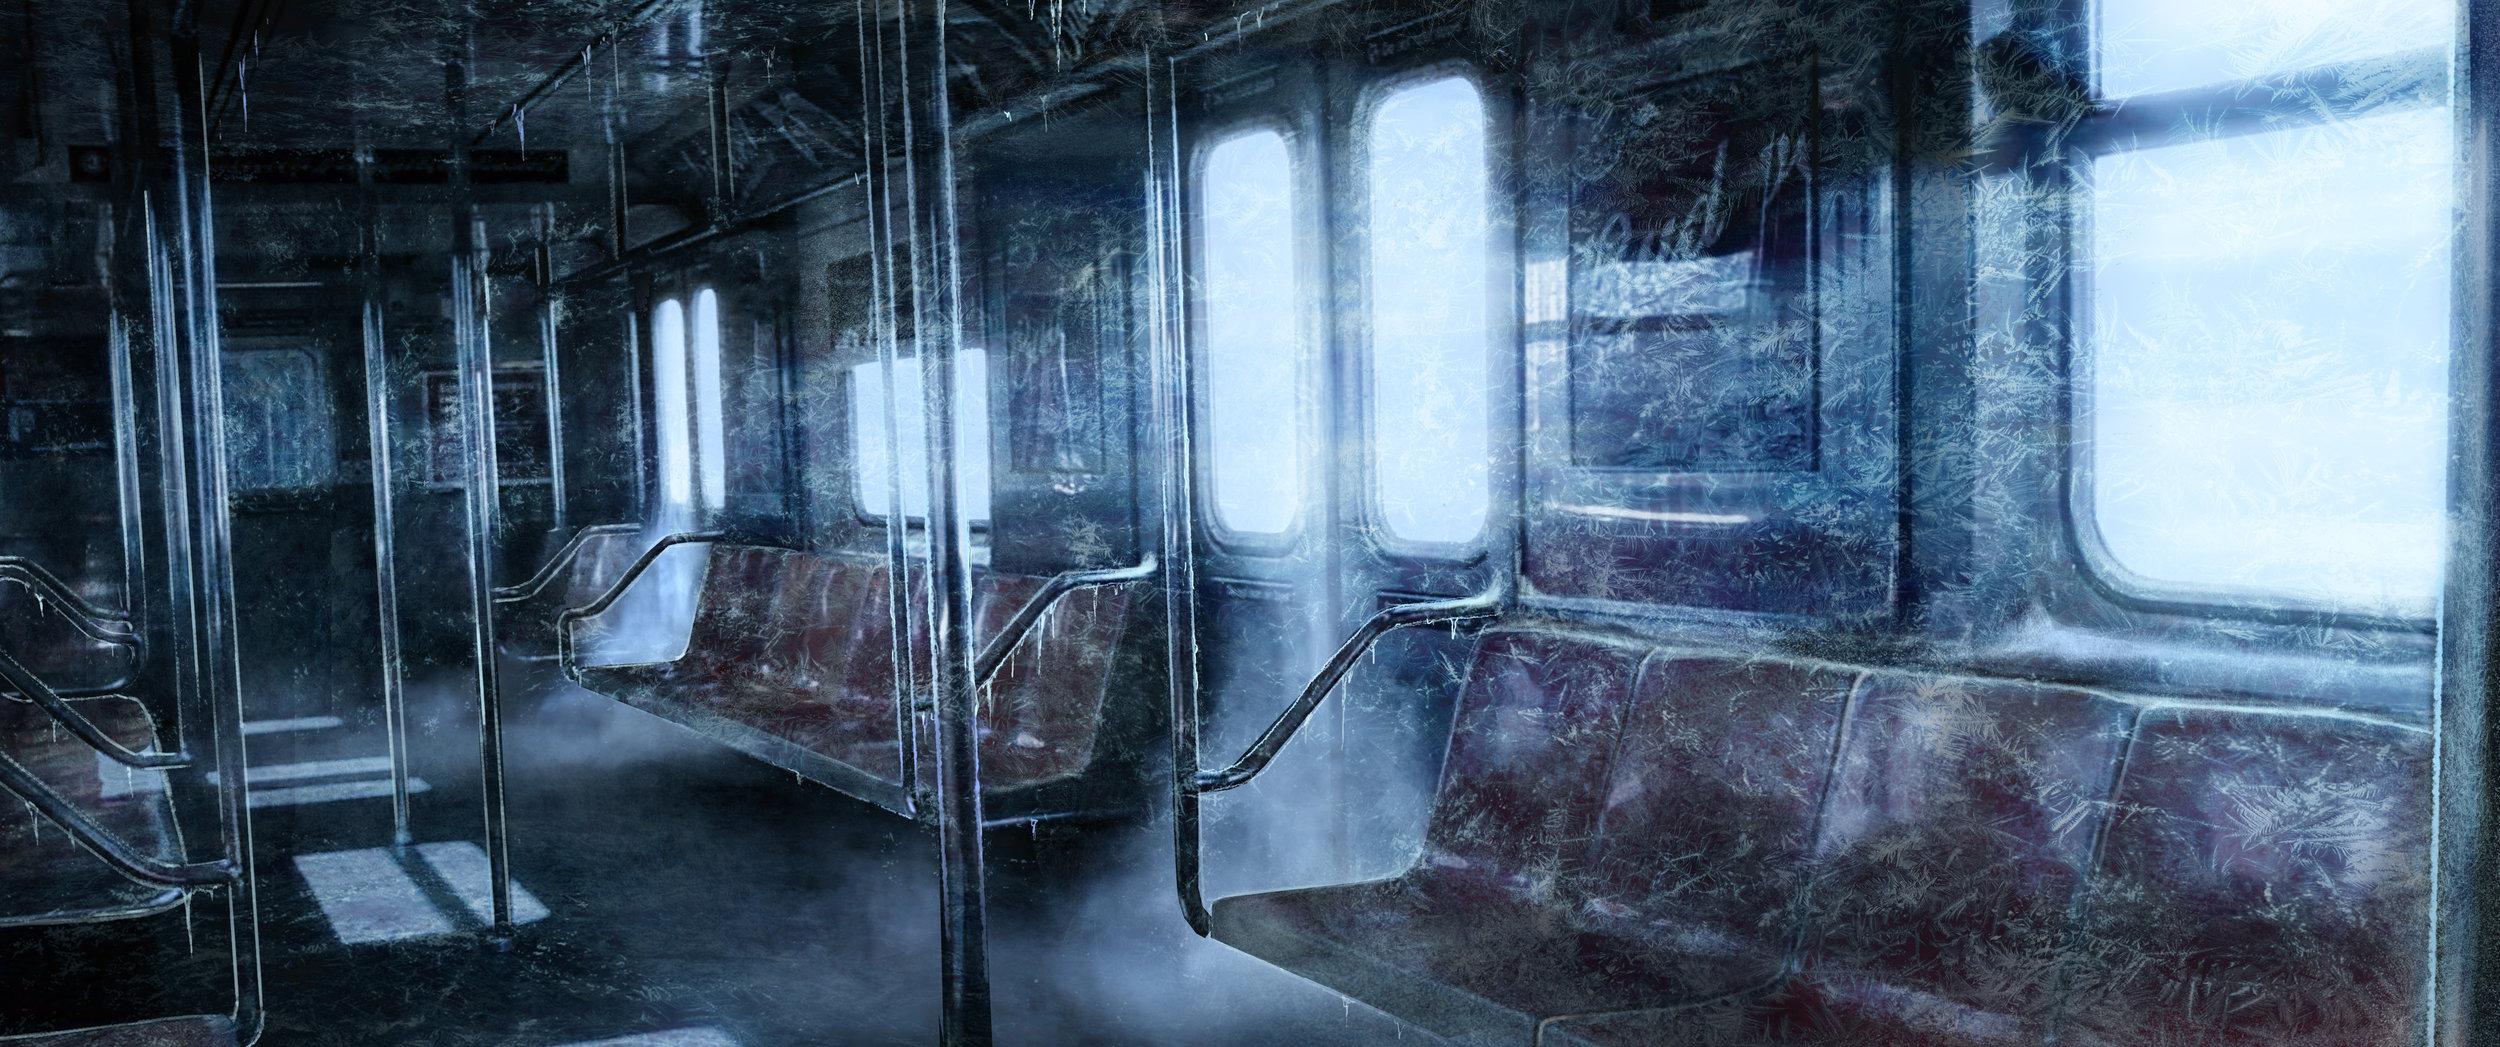 ELE_TRANSITION_styleframe_mp_v002_ELE_TRANSITION_subway_stage_11.jpg